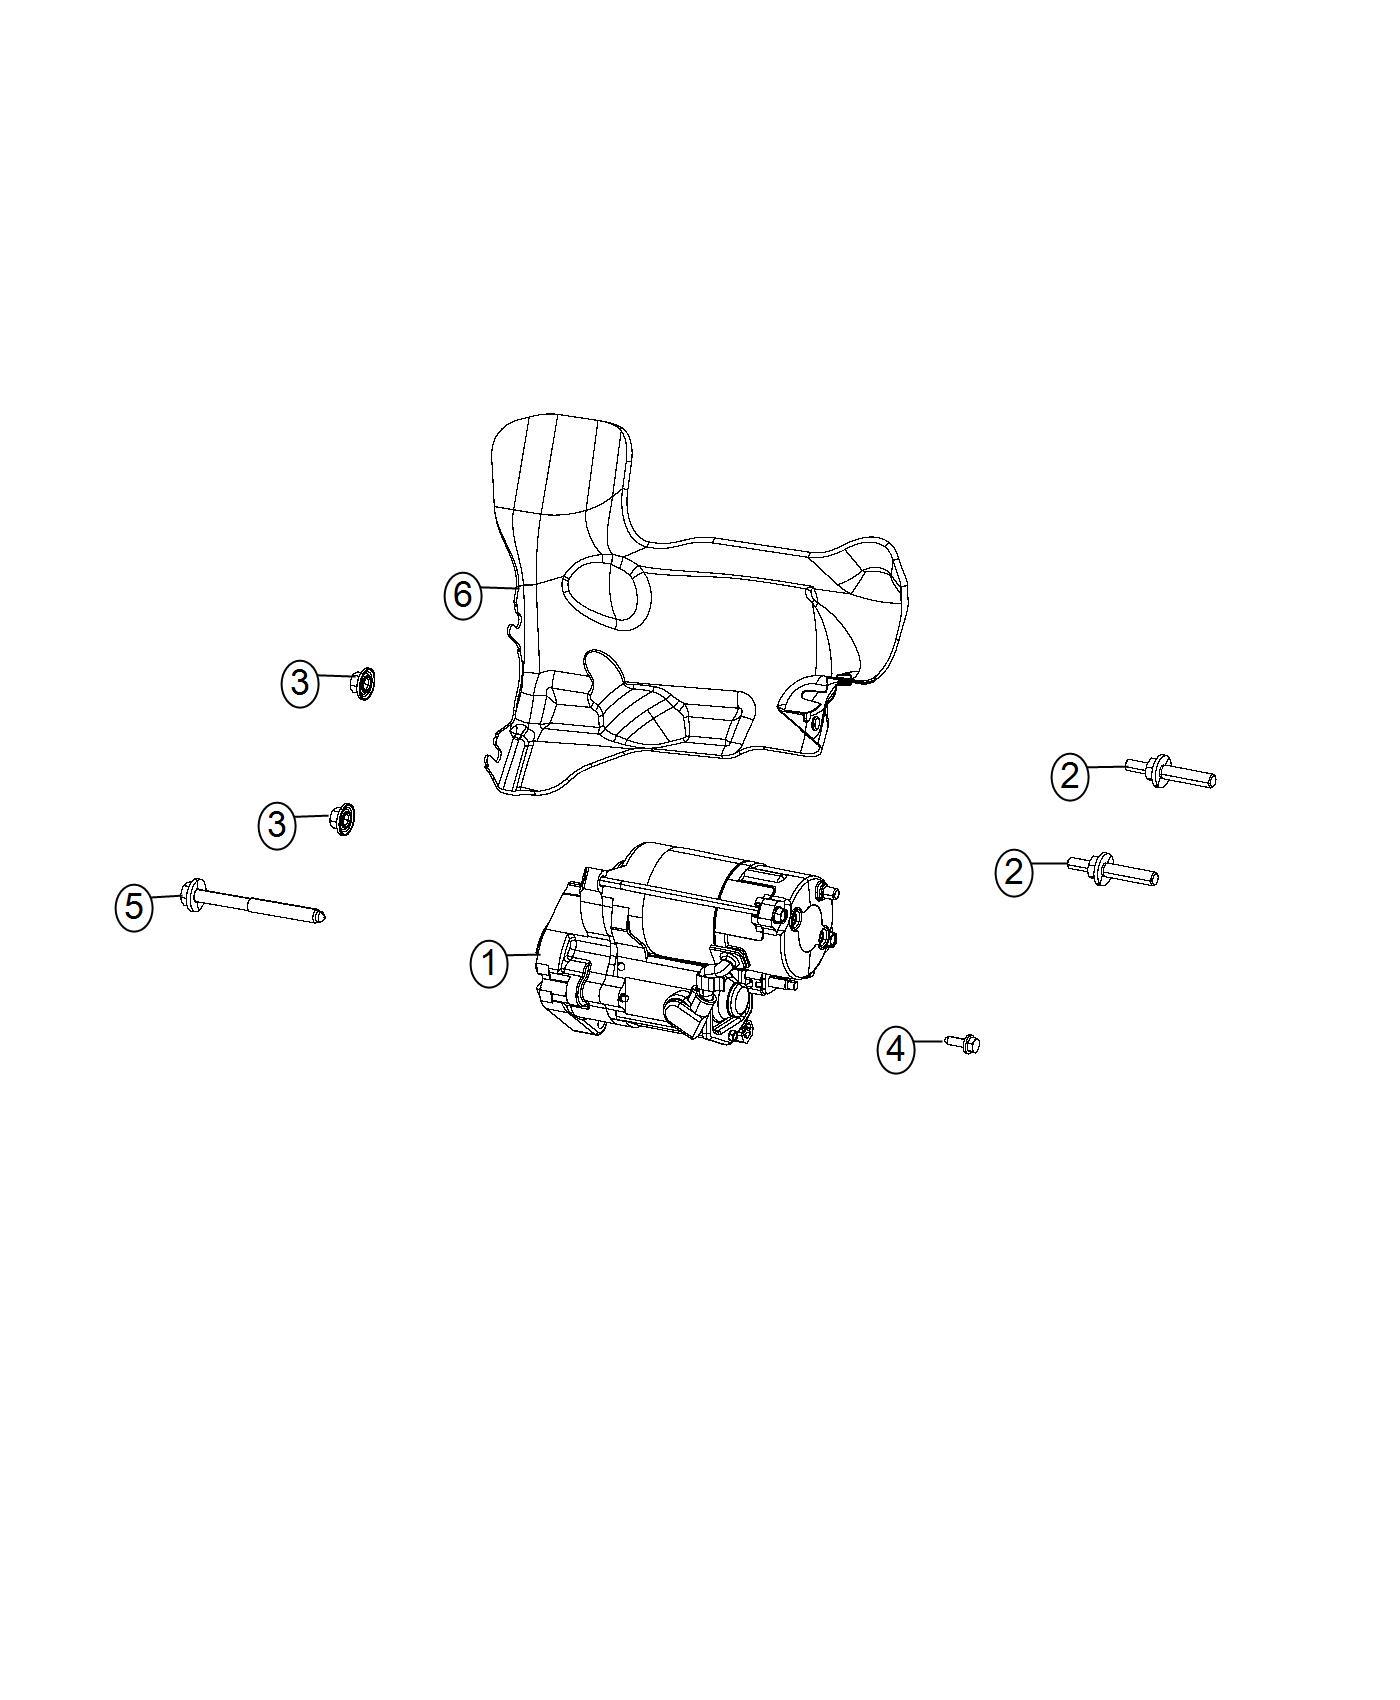 Dodge Challenger Starter Engine Related Starters